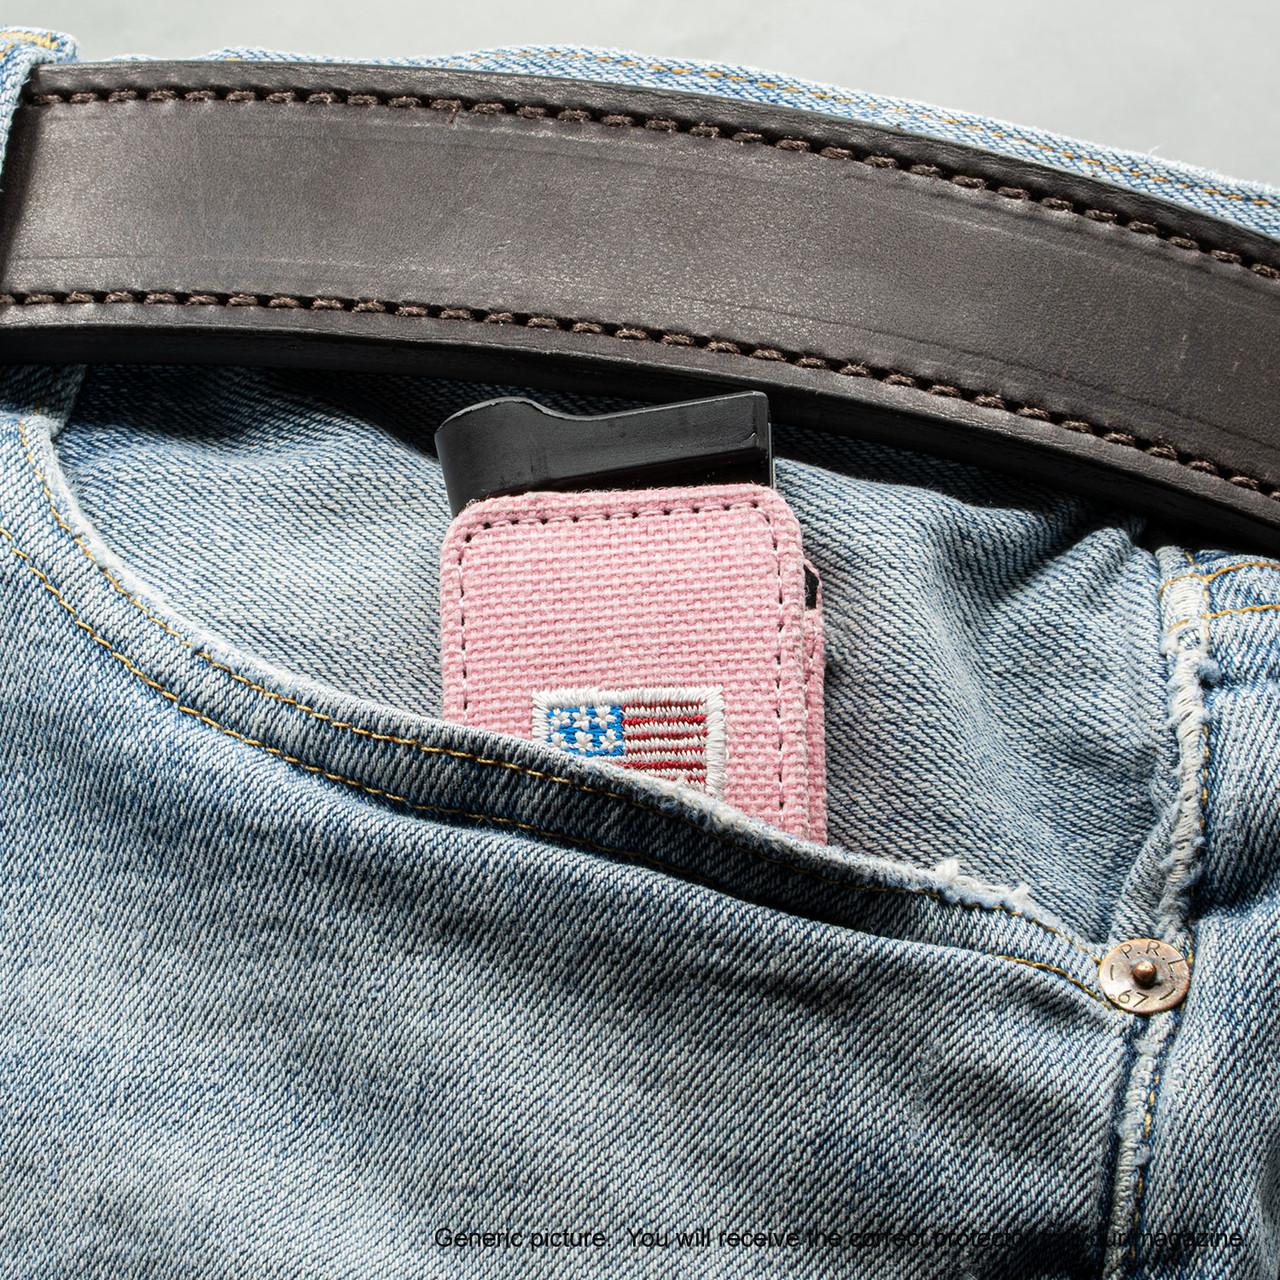 Taurus G2S Pink Canvas Flag Magazine Pocket Protector